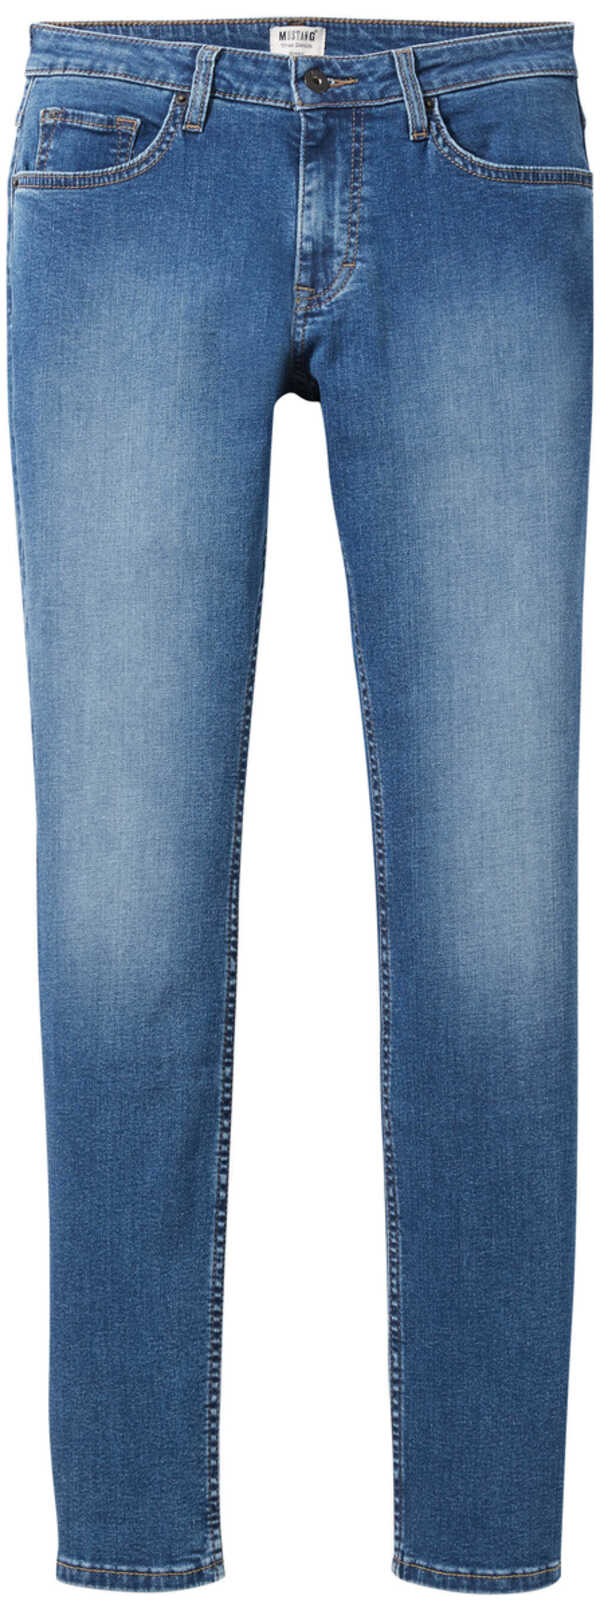 MUSTANG  Damen-Jeans